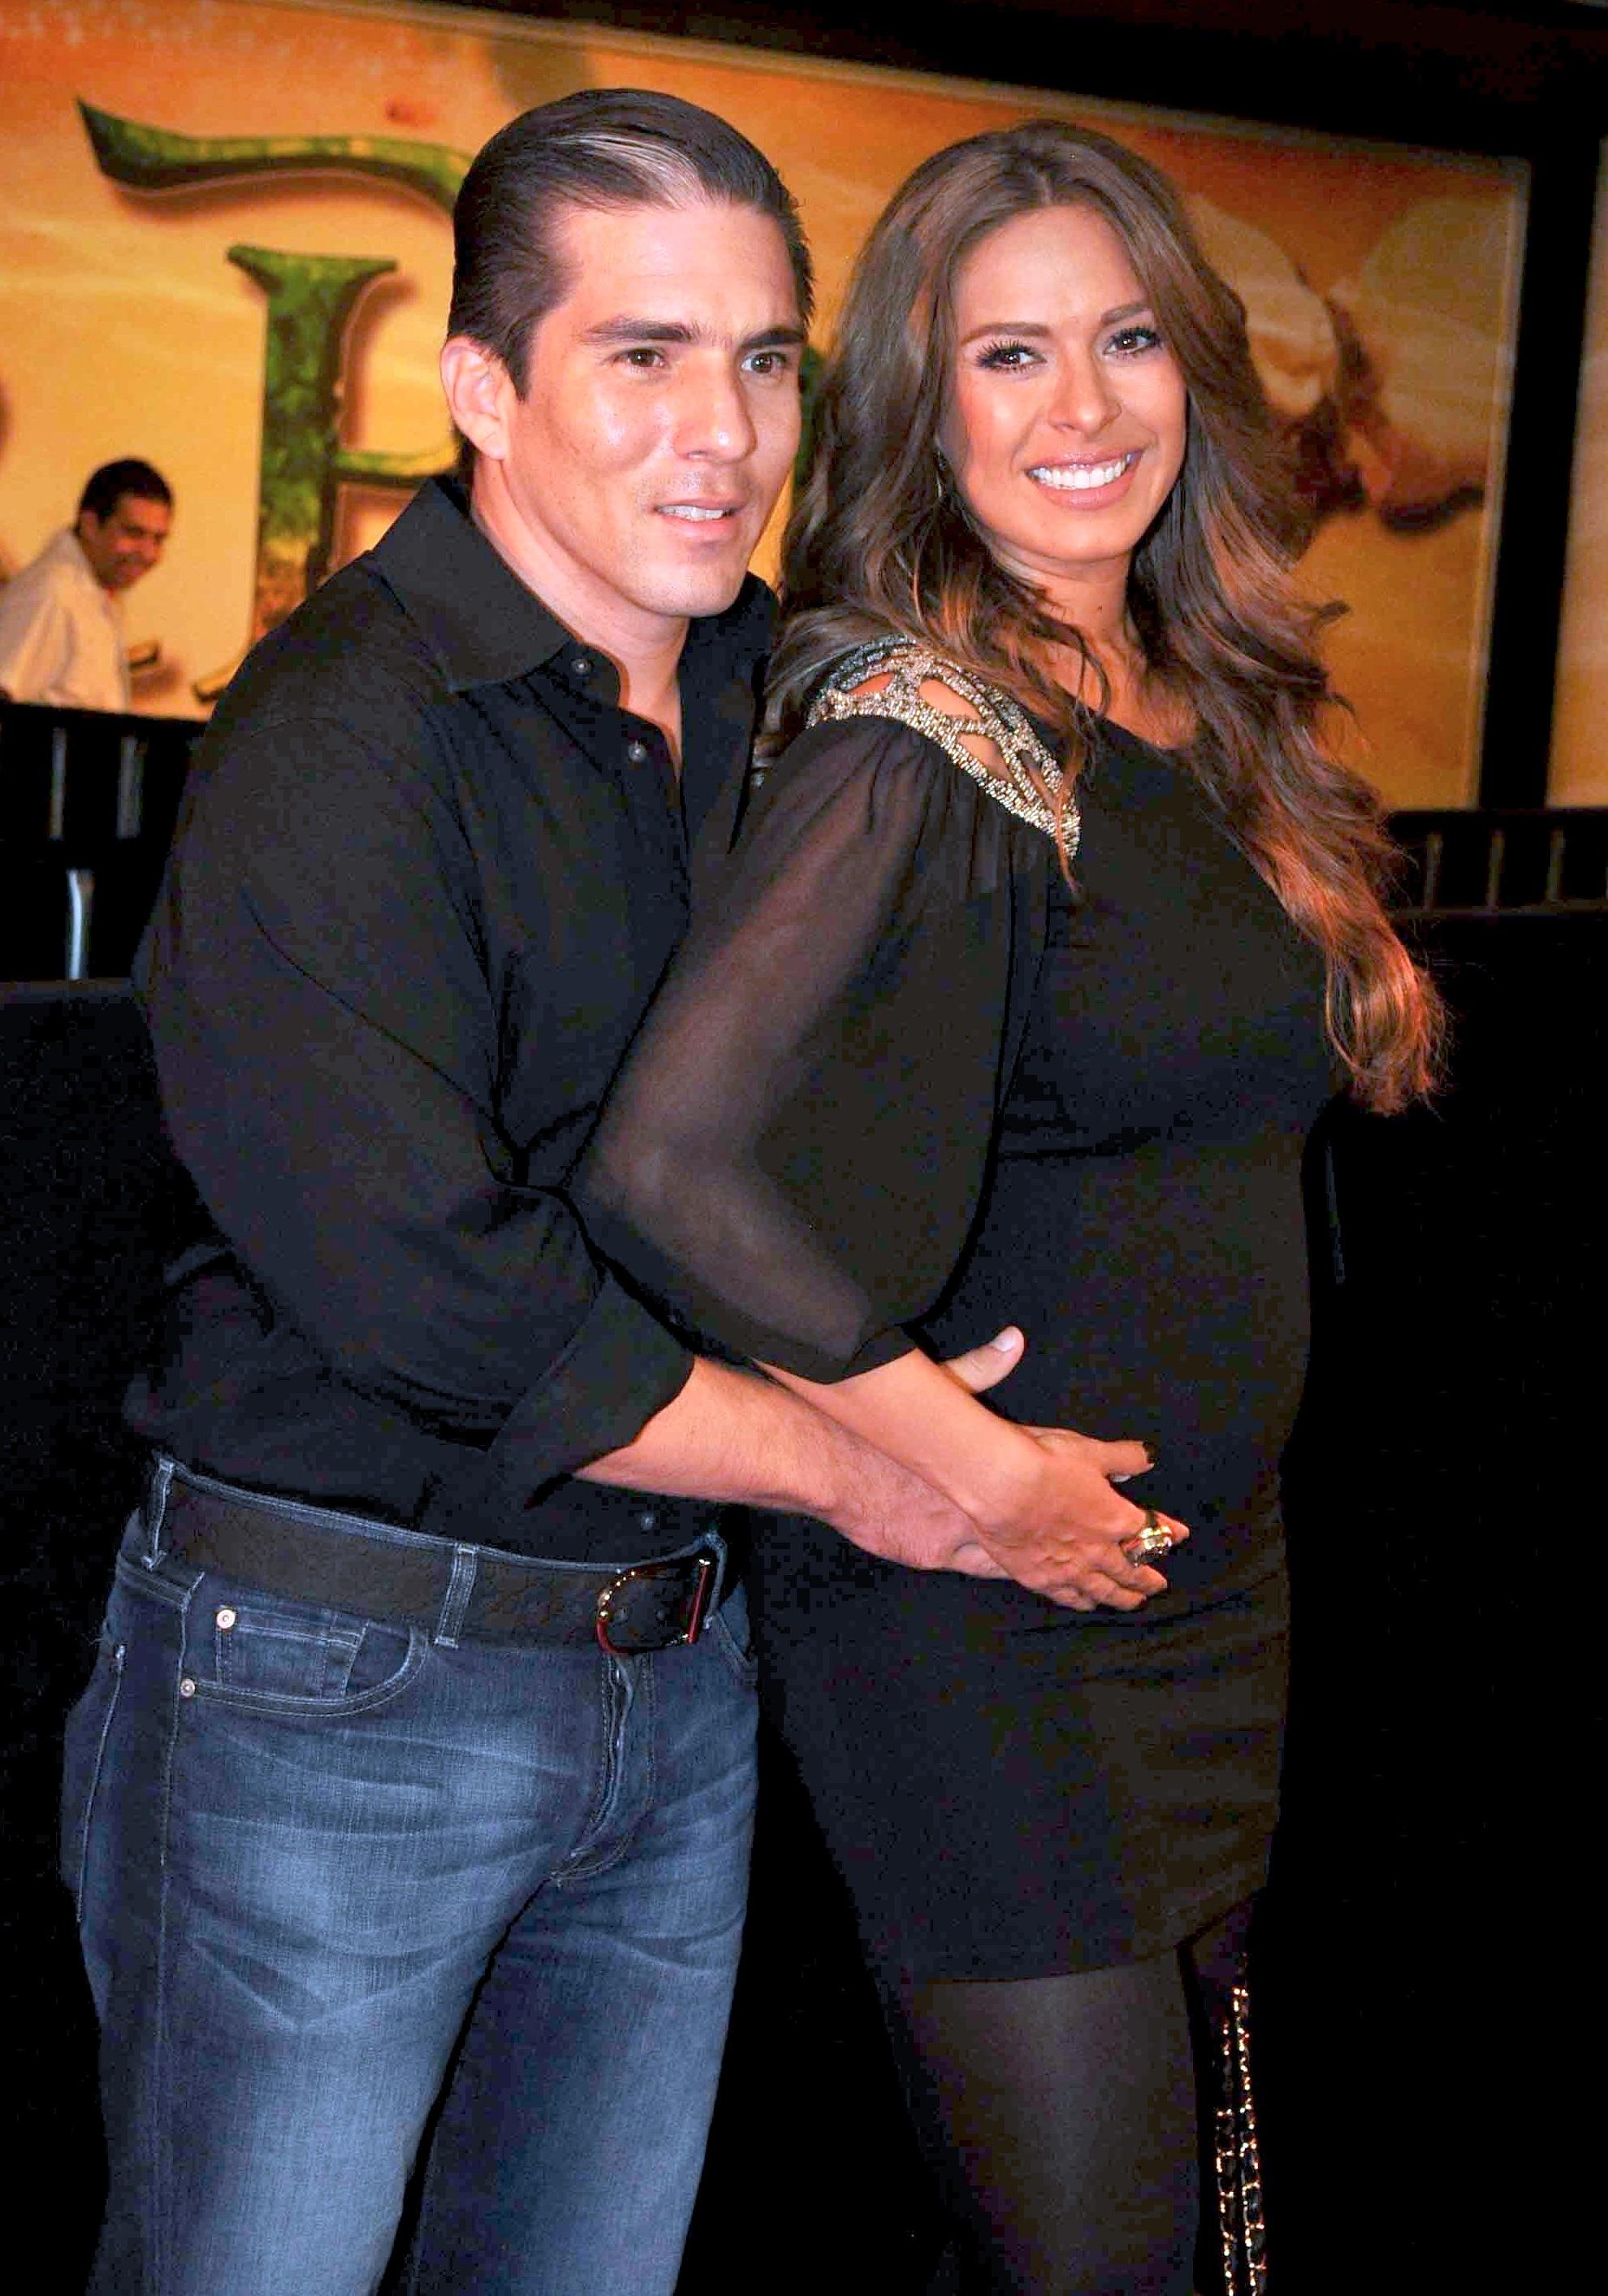 Fernando Reina and Galilea Montijo